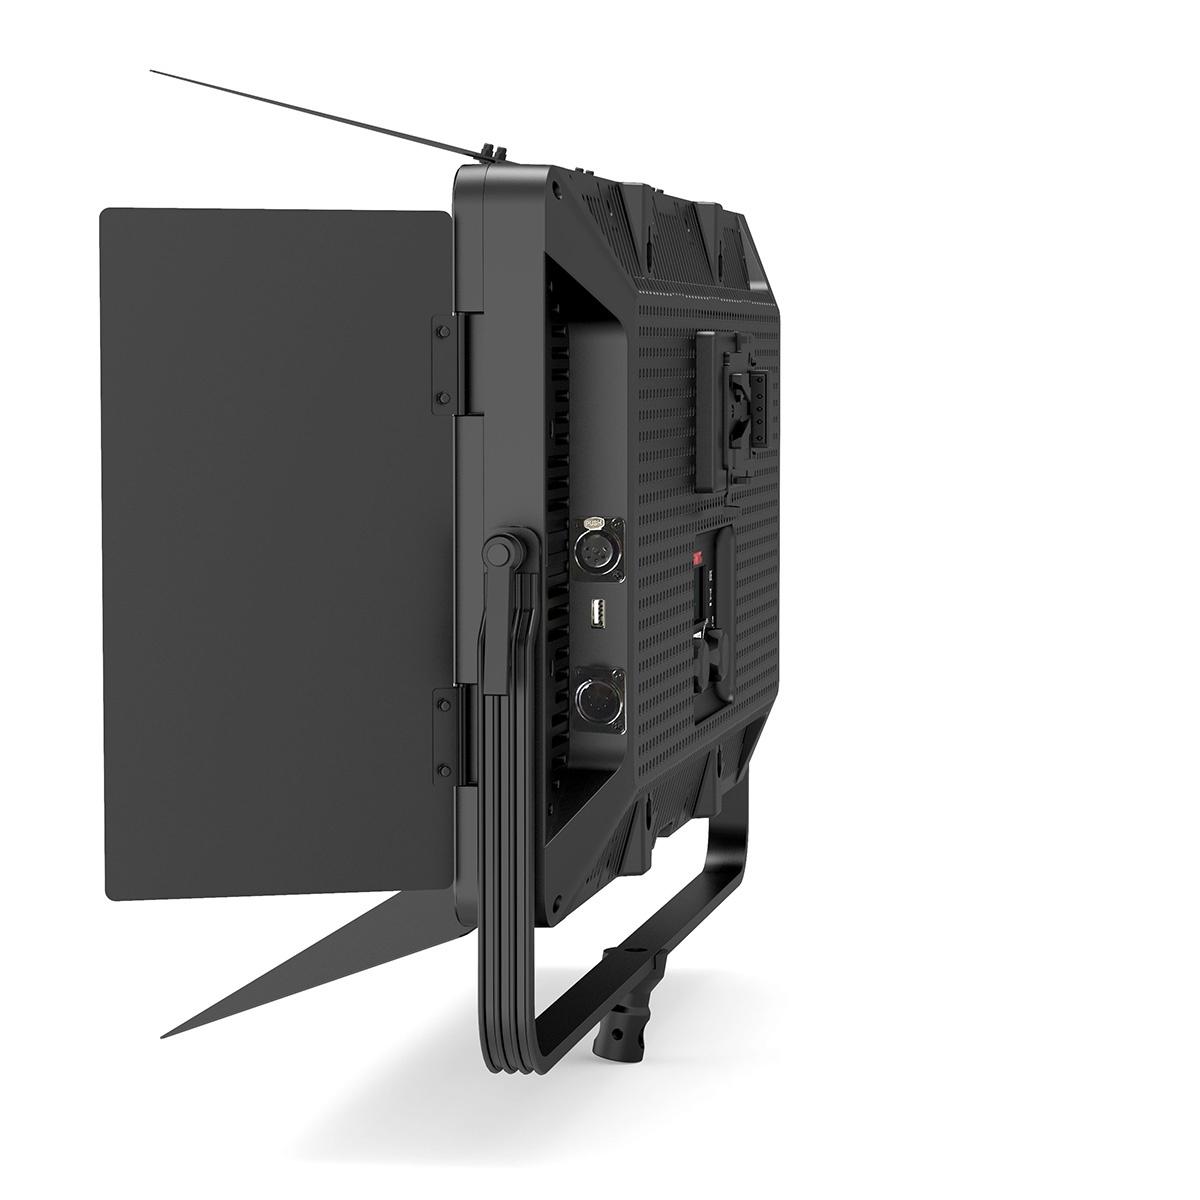 SWIT CL-120D 120W štúdiové SMD LED panelové svetlo s DMX ovládaním